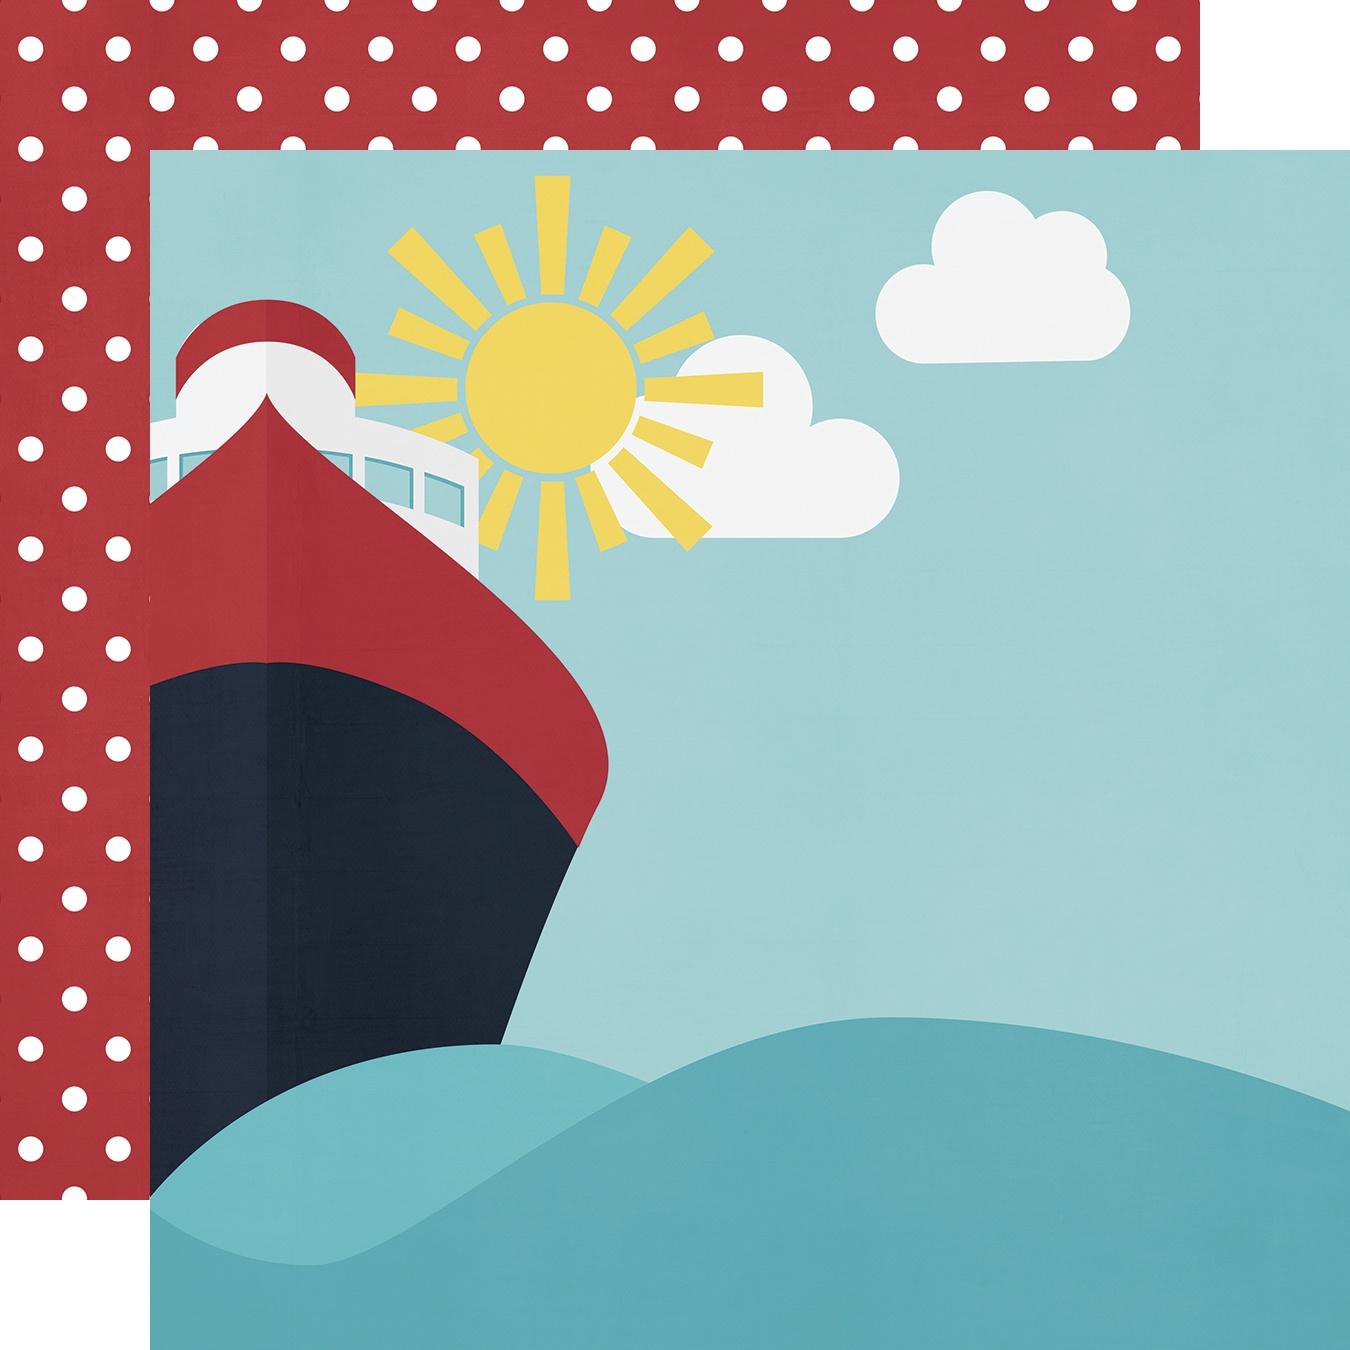 Crusin' Set Sail